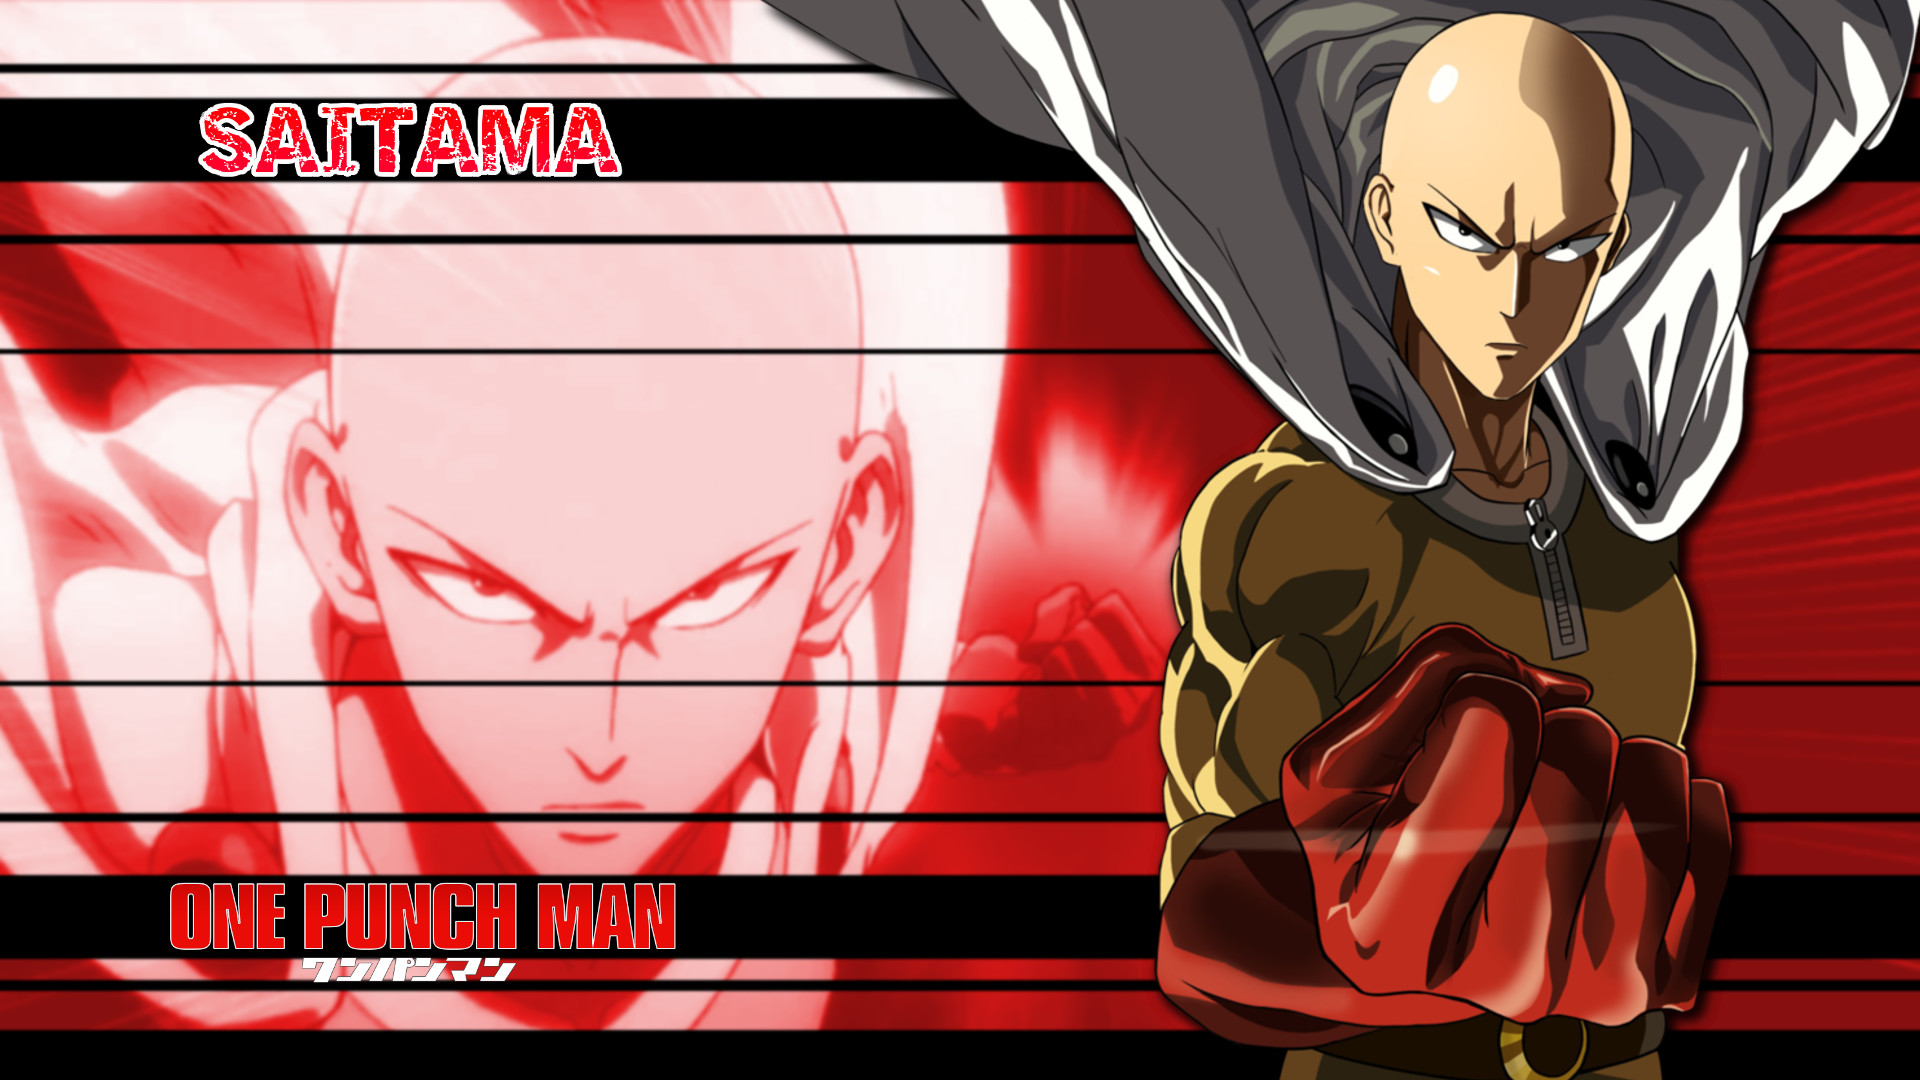 Saitama Images - One Punch Man Saitama Wallpapers (76+ images)